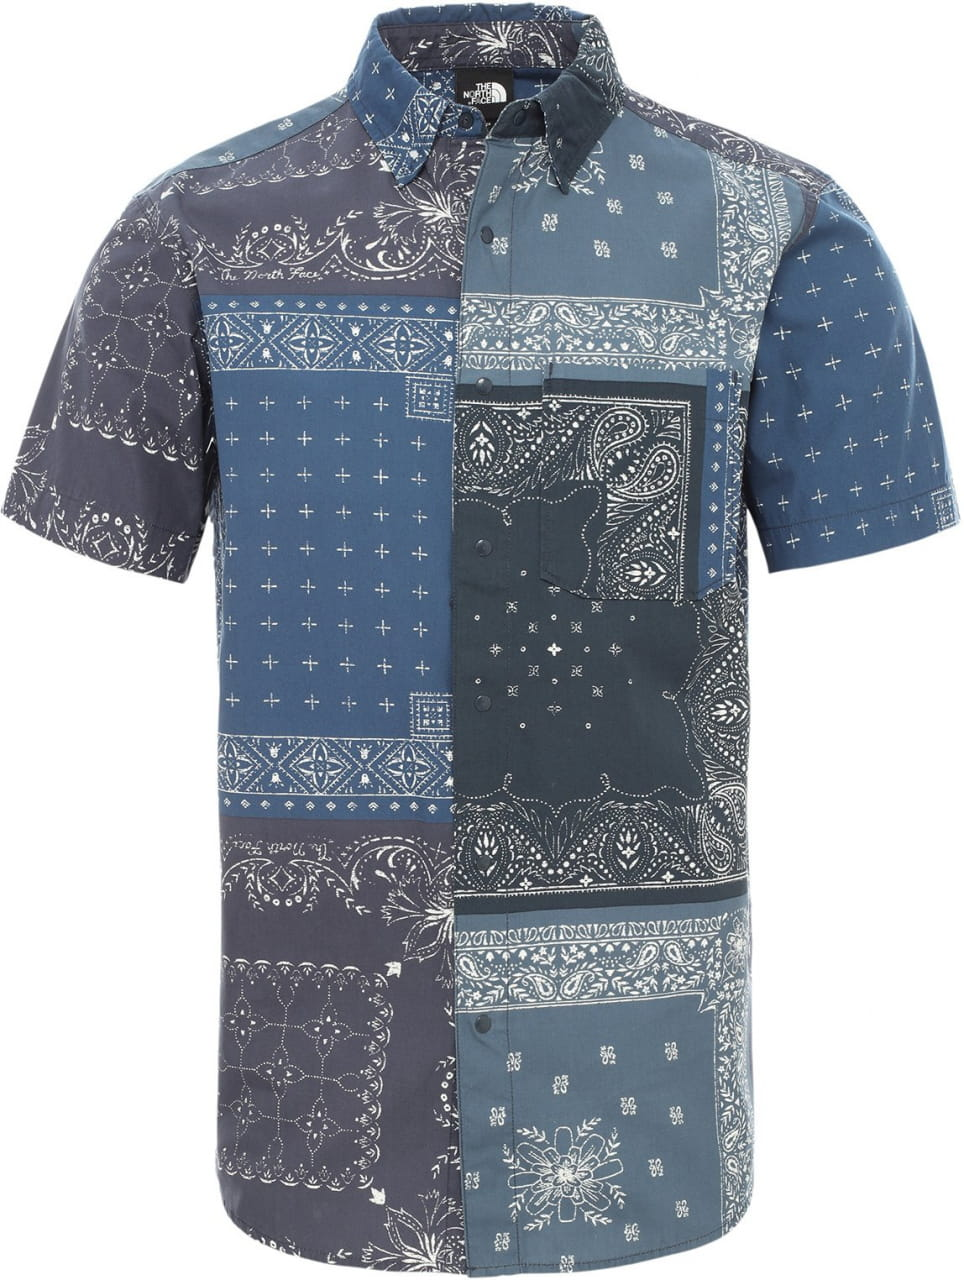 T-Shirts The North Face Men's Baytrail Pattern Short-Sleeve Shirt